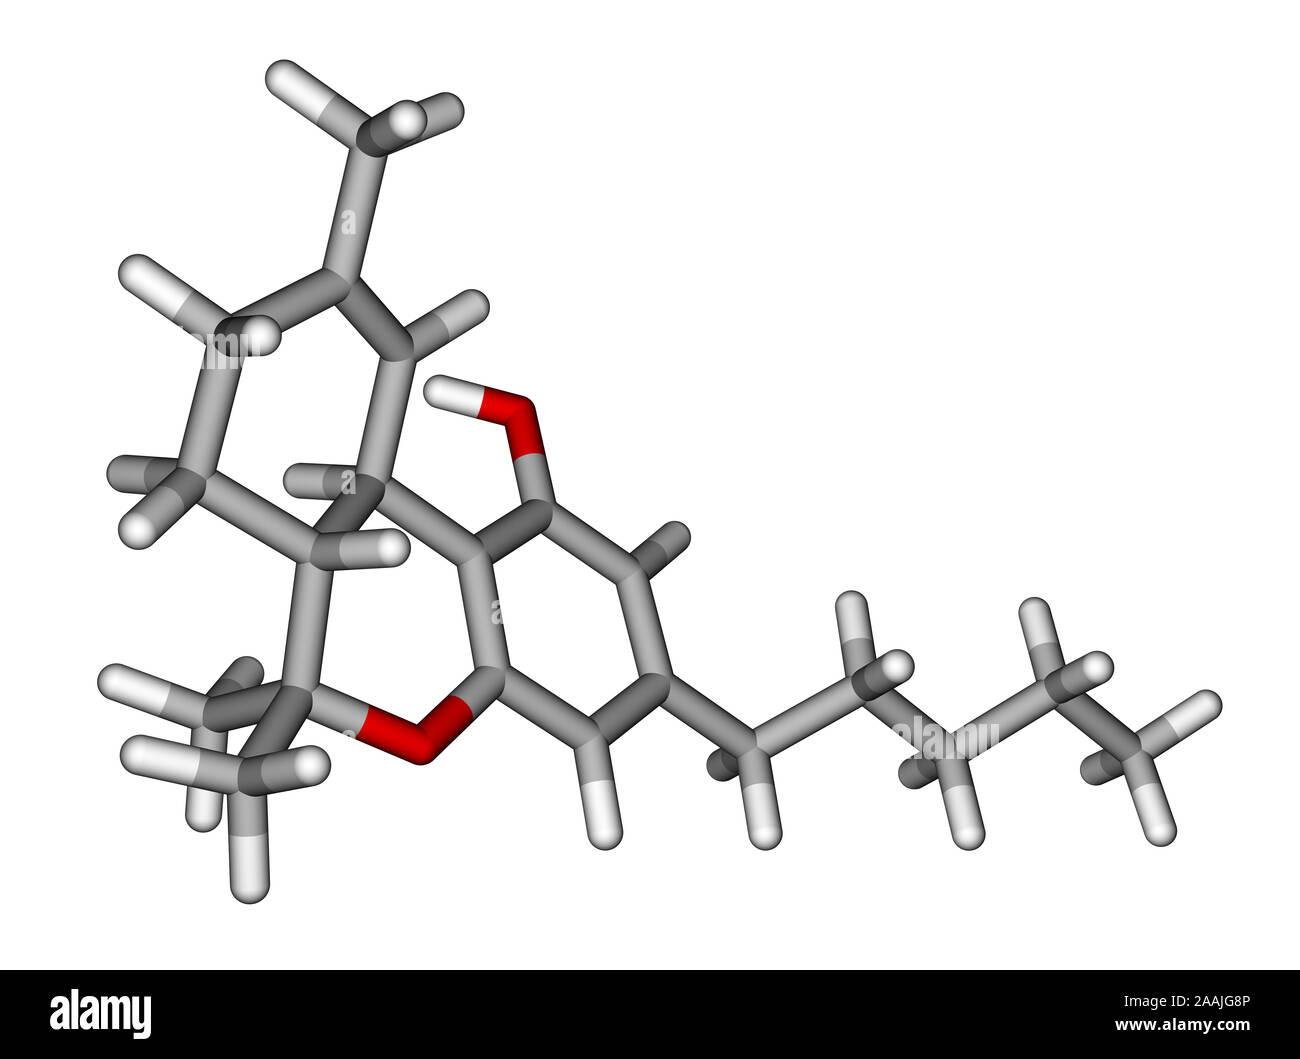 Tetrahydrocannabinol sticks molecular model Stock Photo